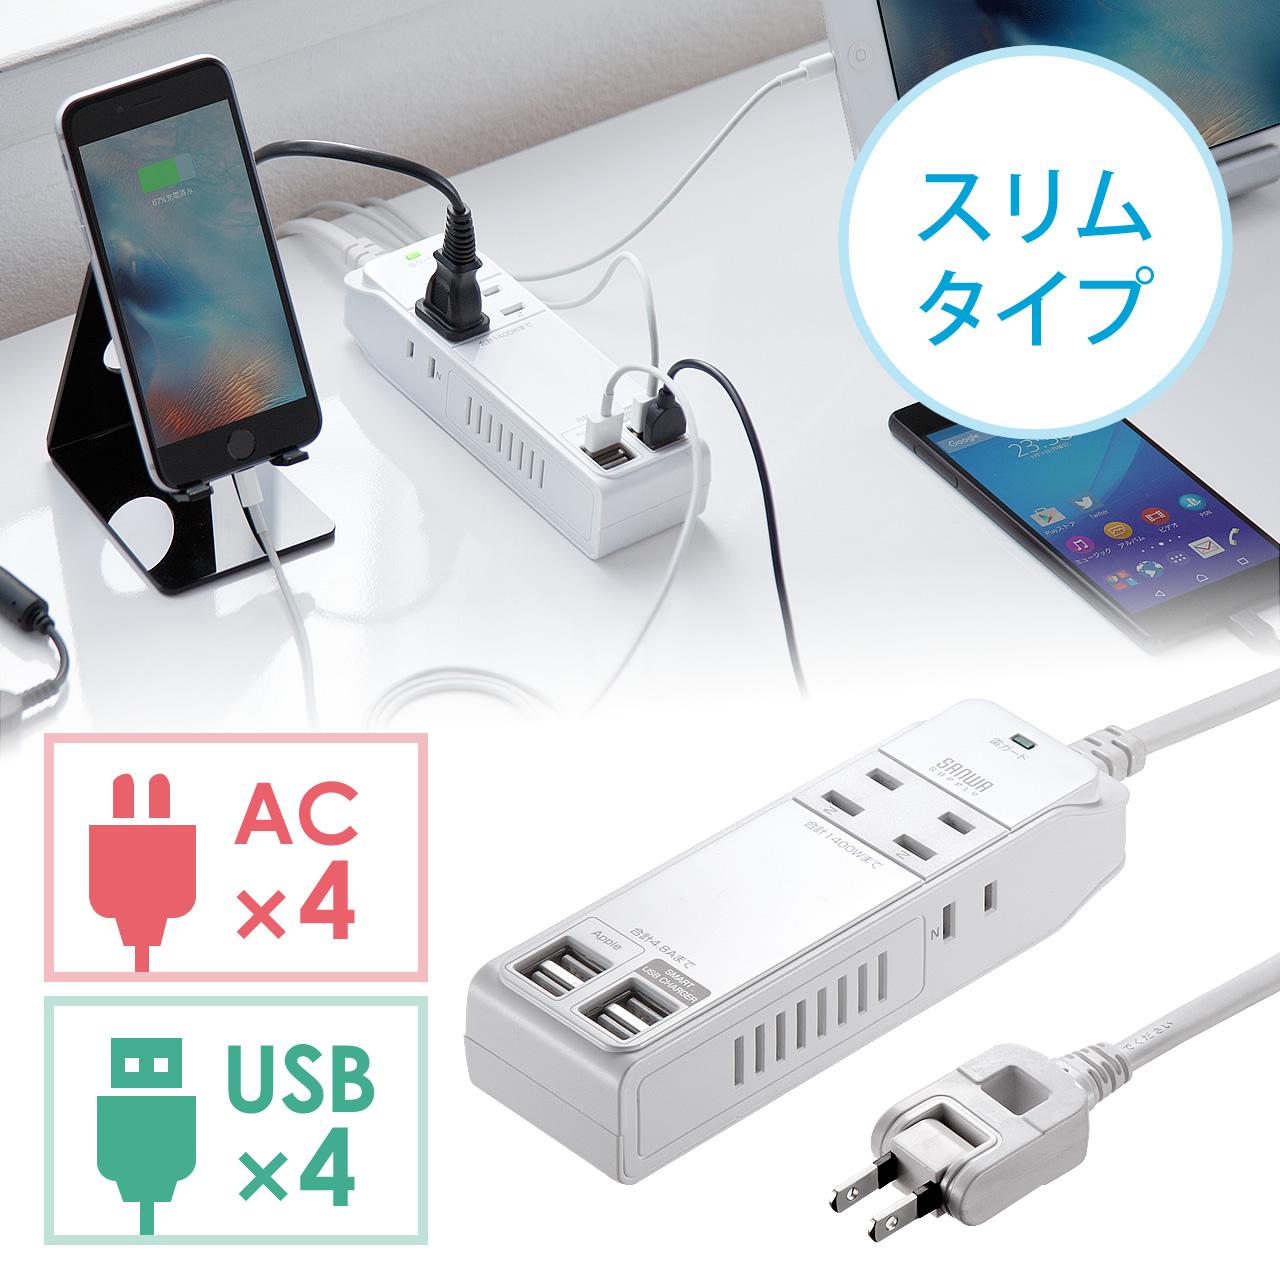 usb充電ポート付電源タップ(4ポート合計最大4.8a出力・4個口・iphone